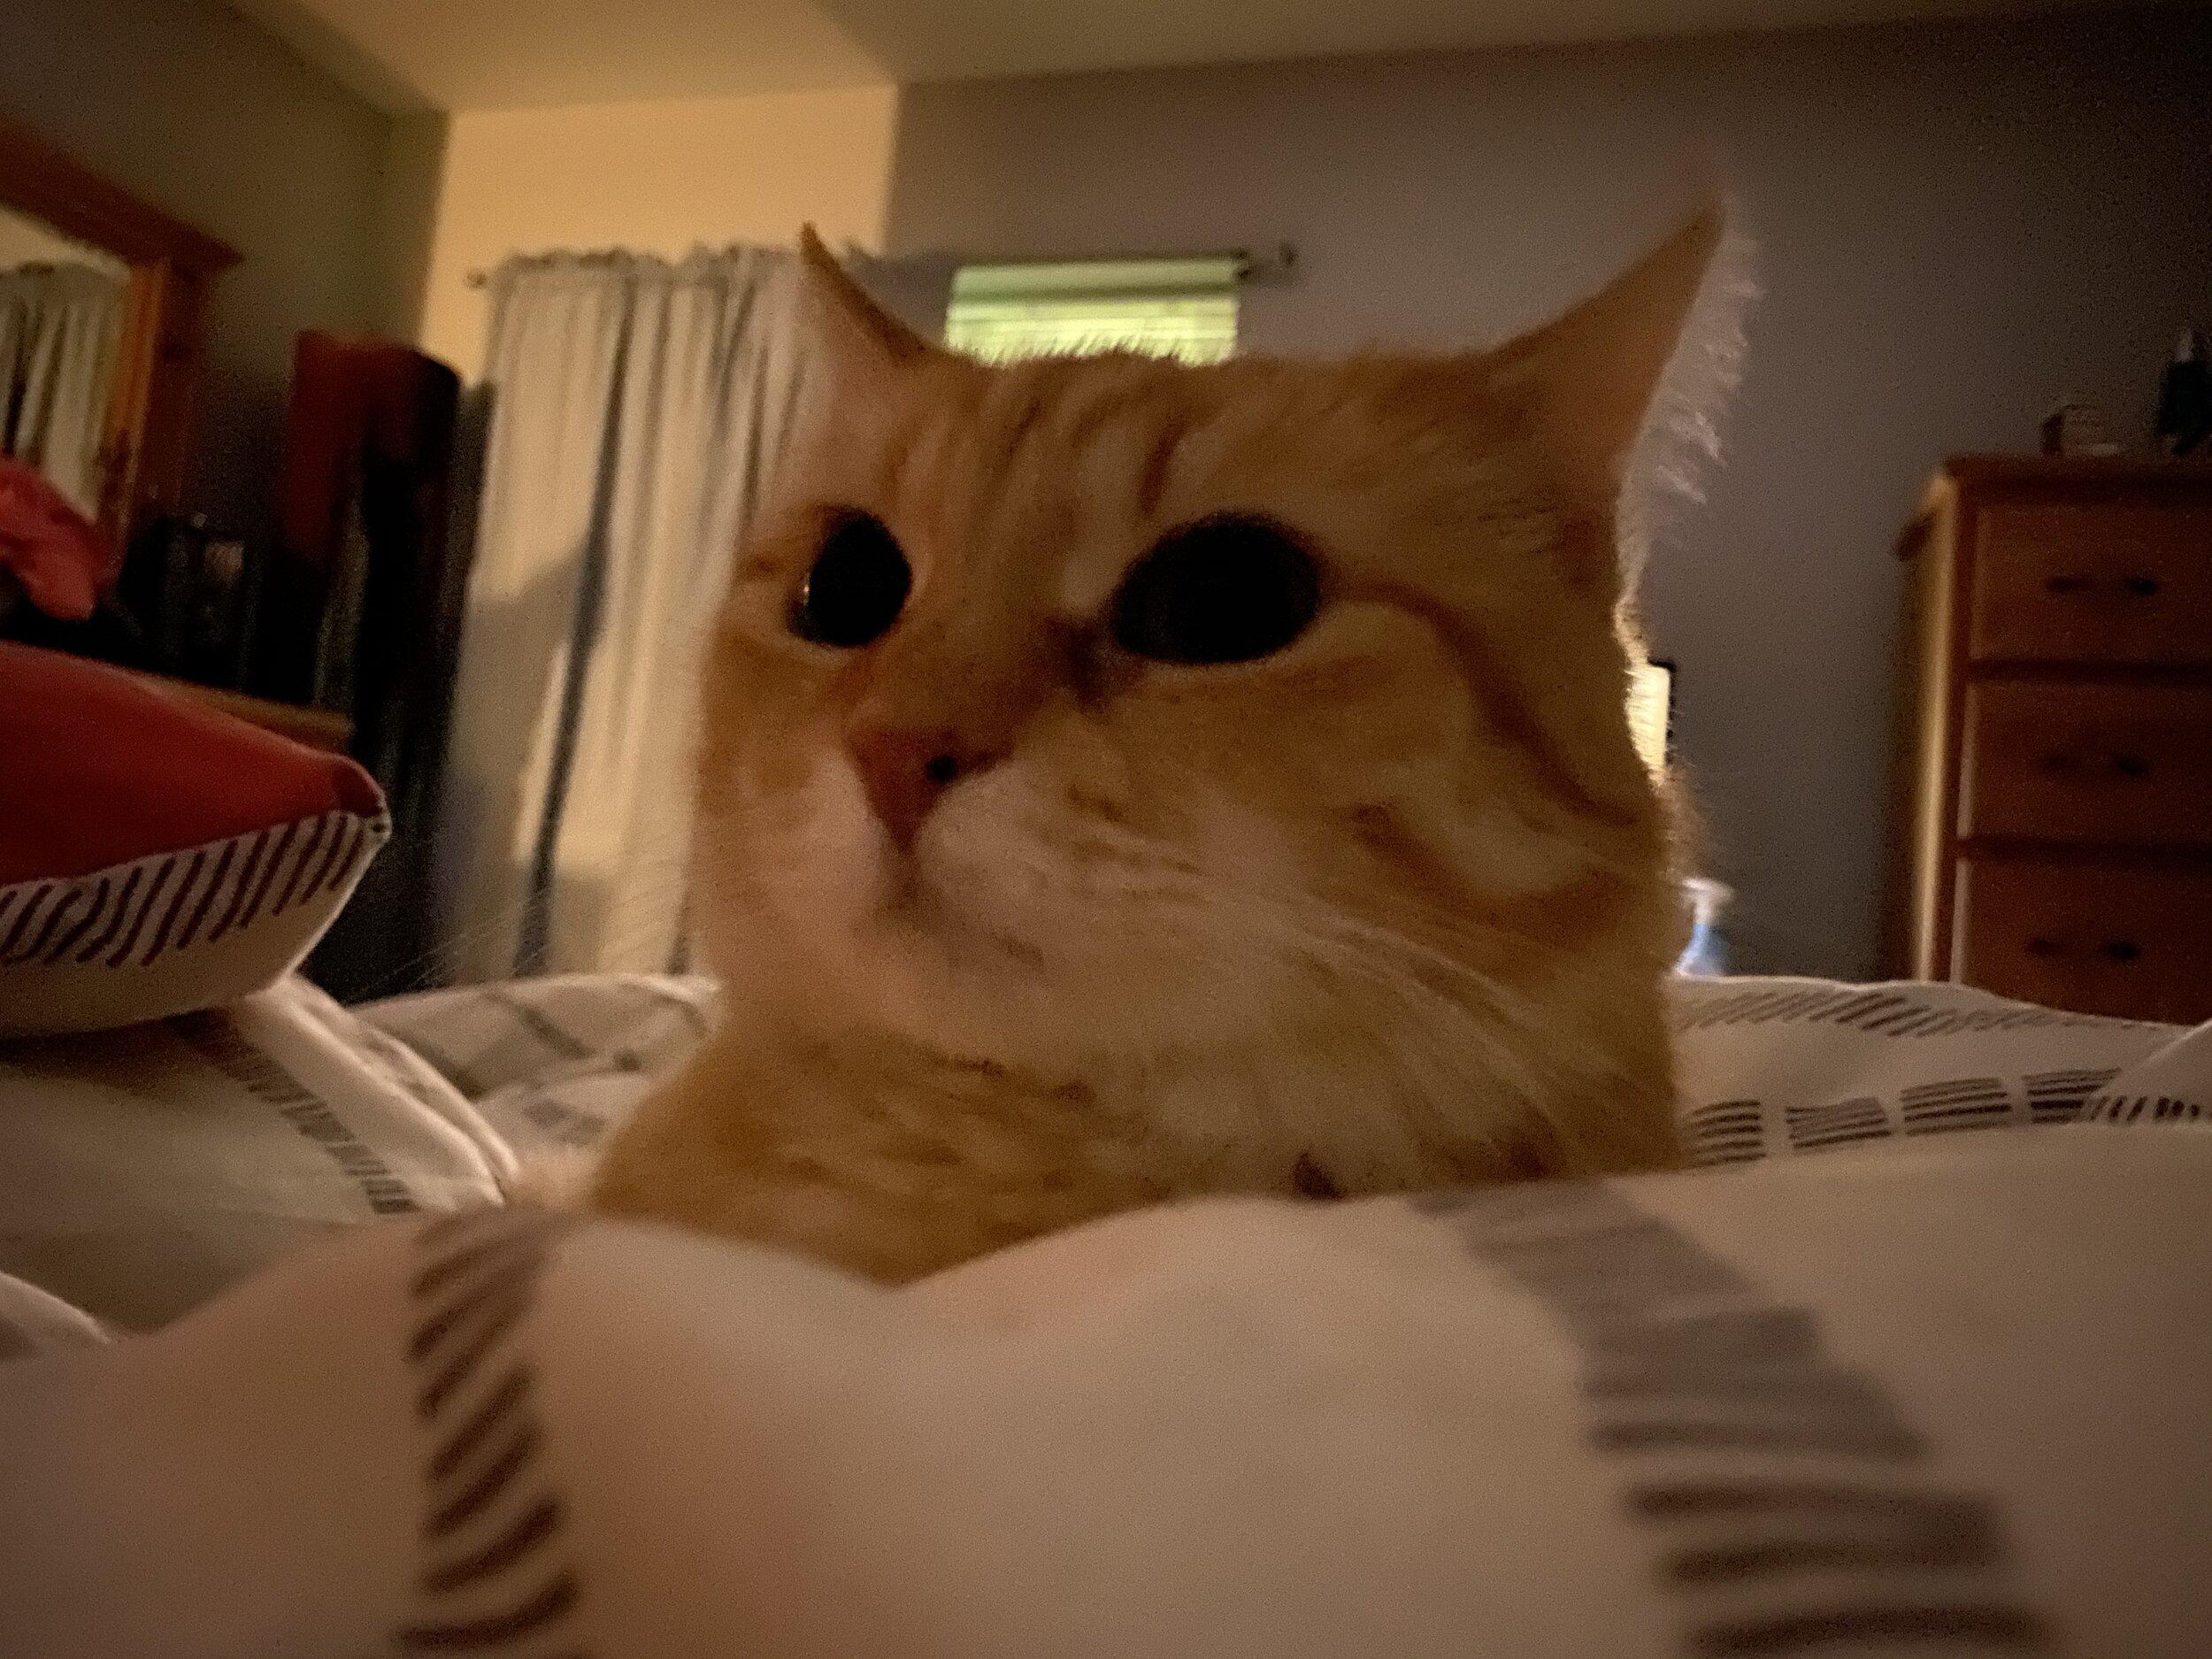 - Bedtime snuggles from Aura Bora